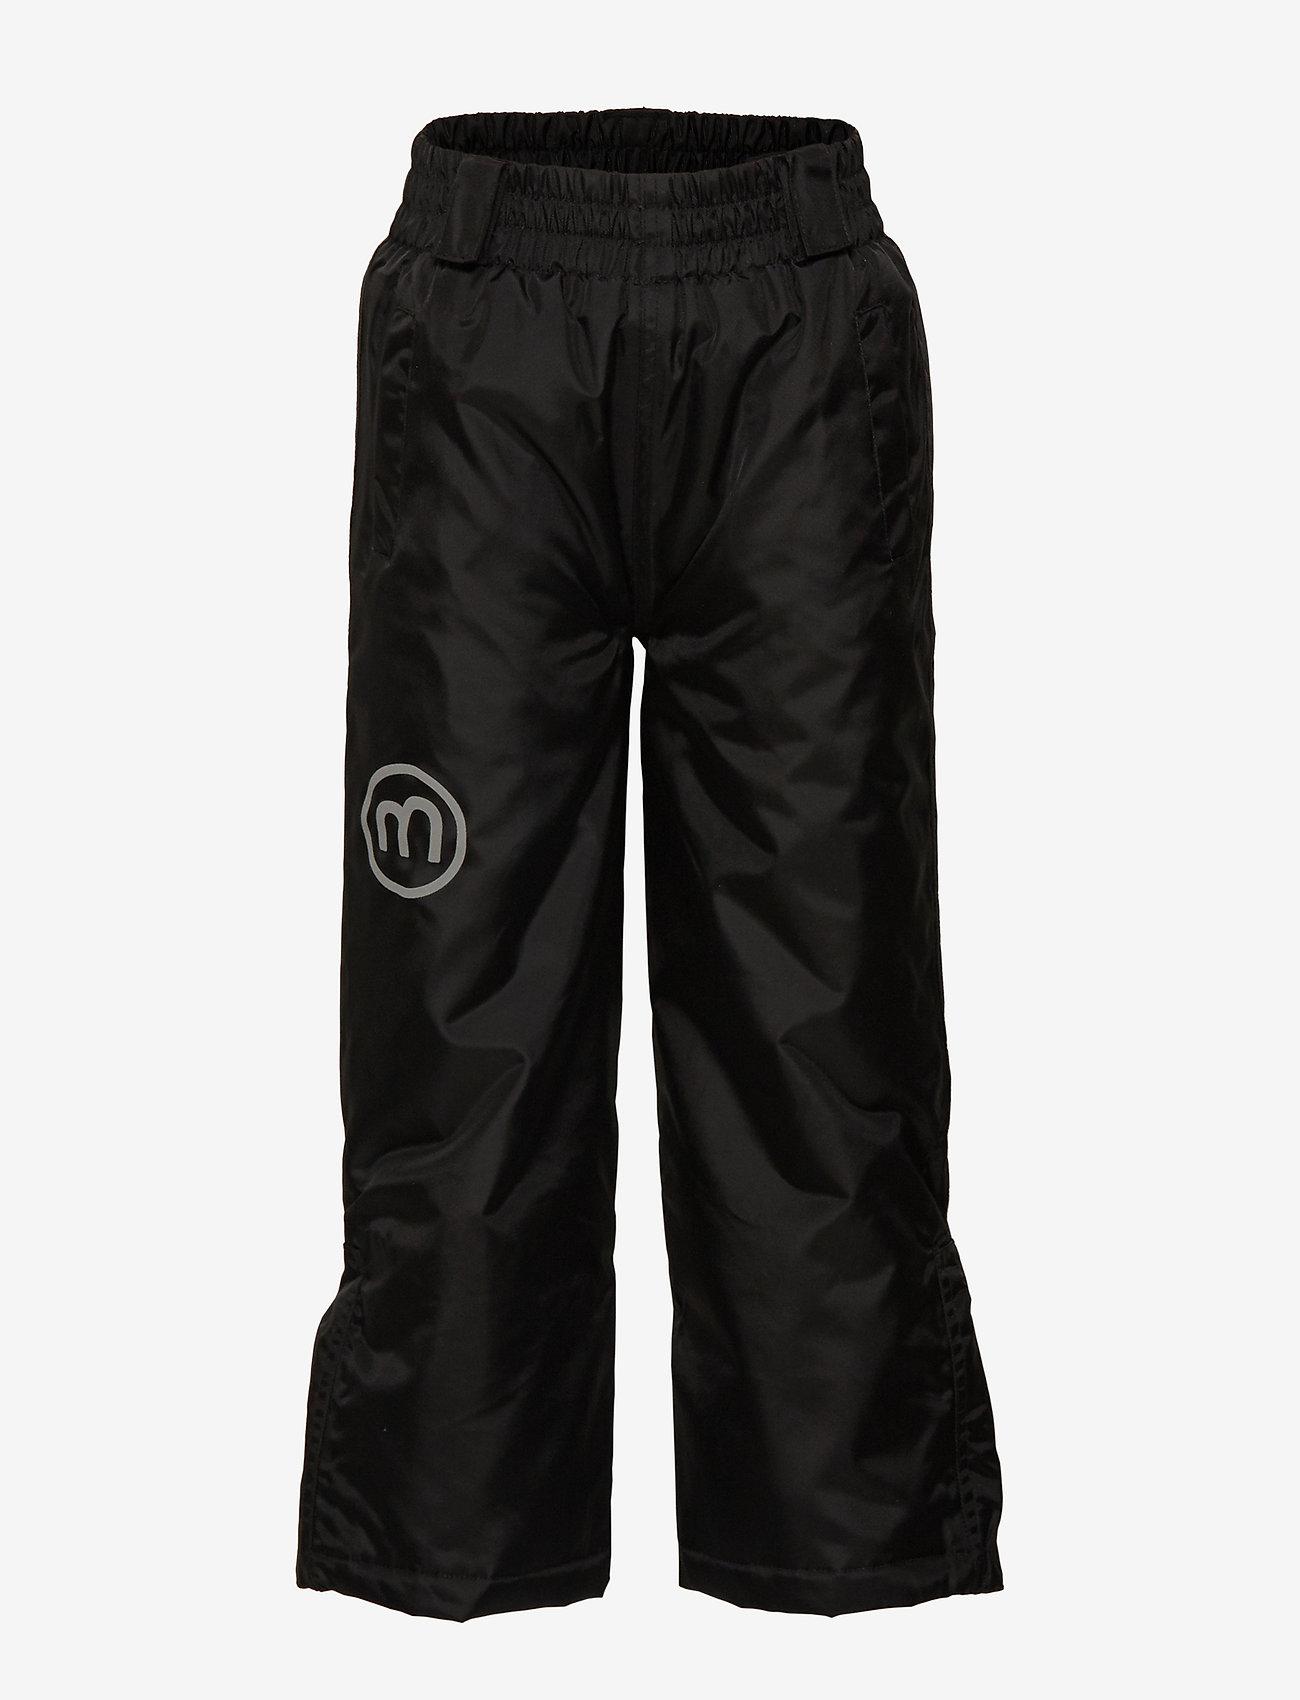 Minymo - Basic 55 -Snowpant -solid - winterbroeken - black - 1